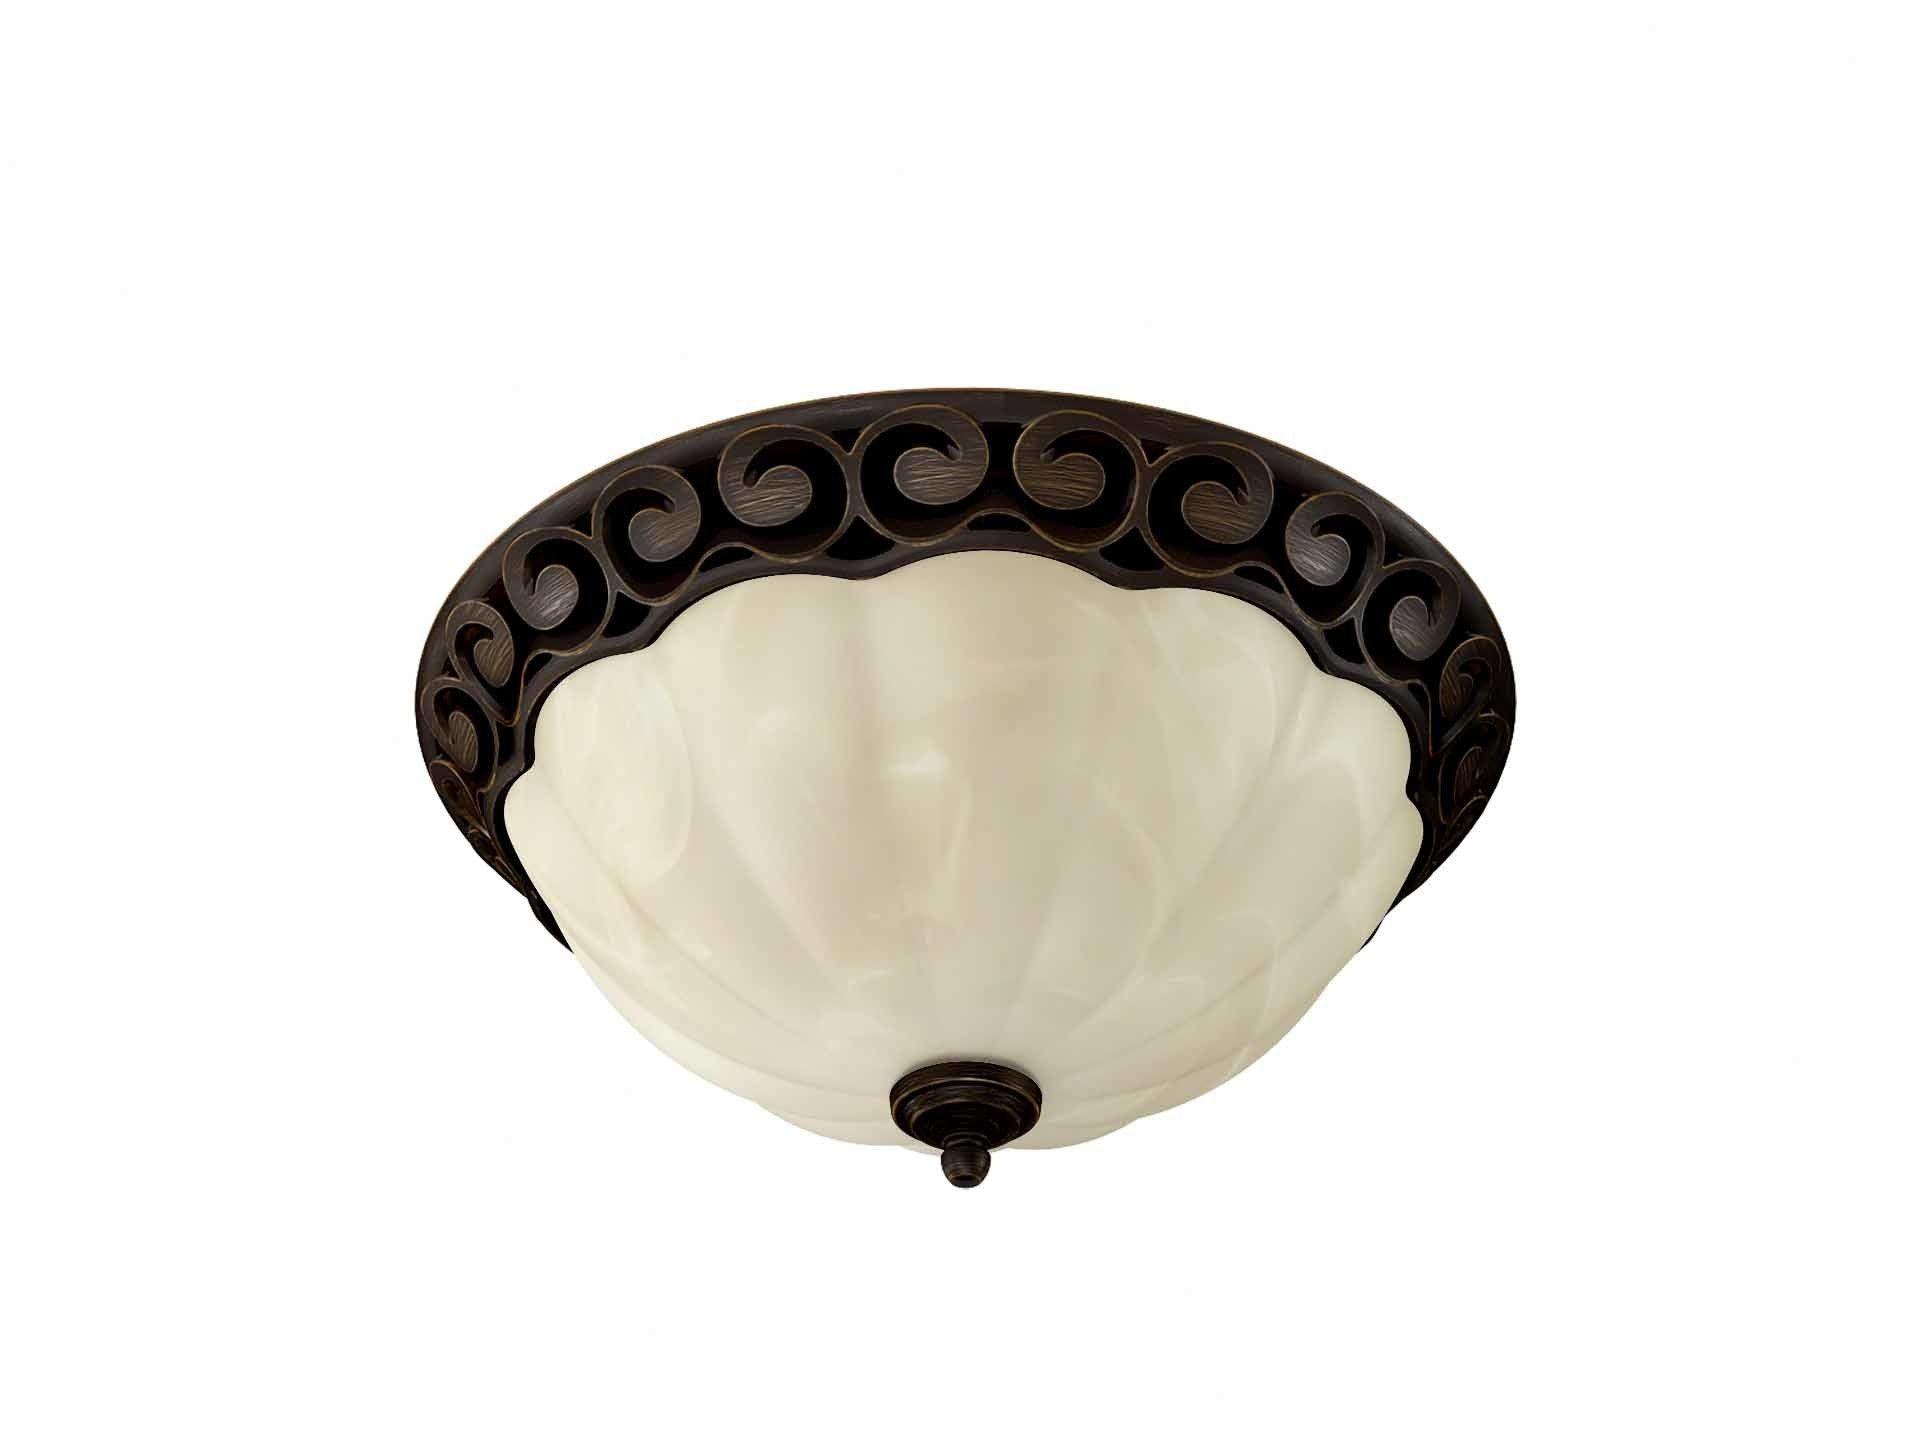 Calcul Cfm Salle De Bain ~ bathroom exhaust fan 70 cfm decorative fan with light in oil